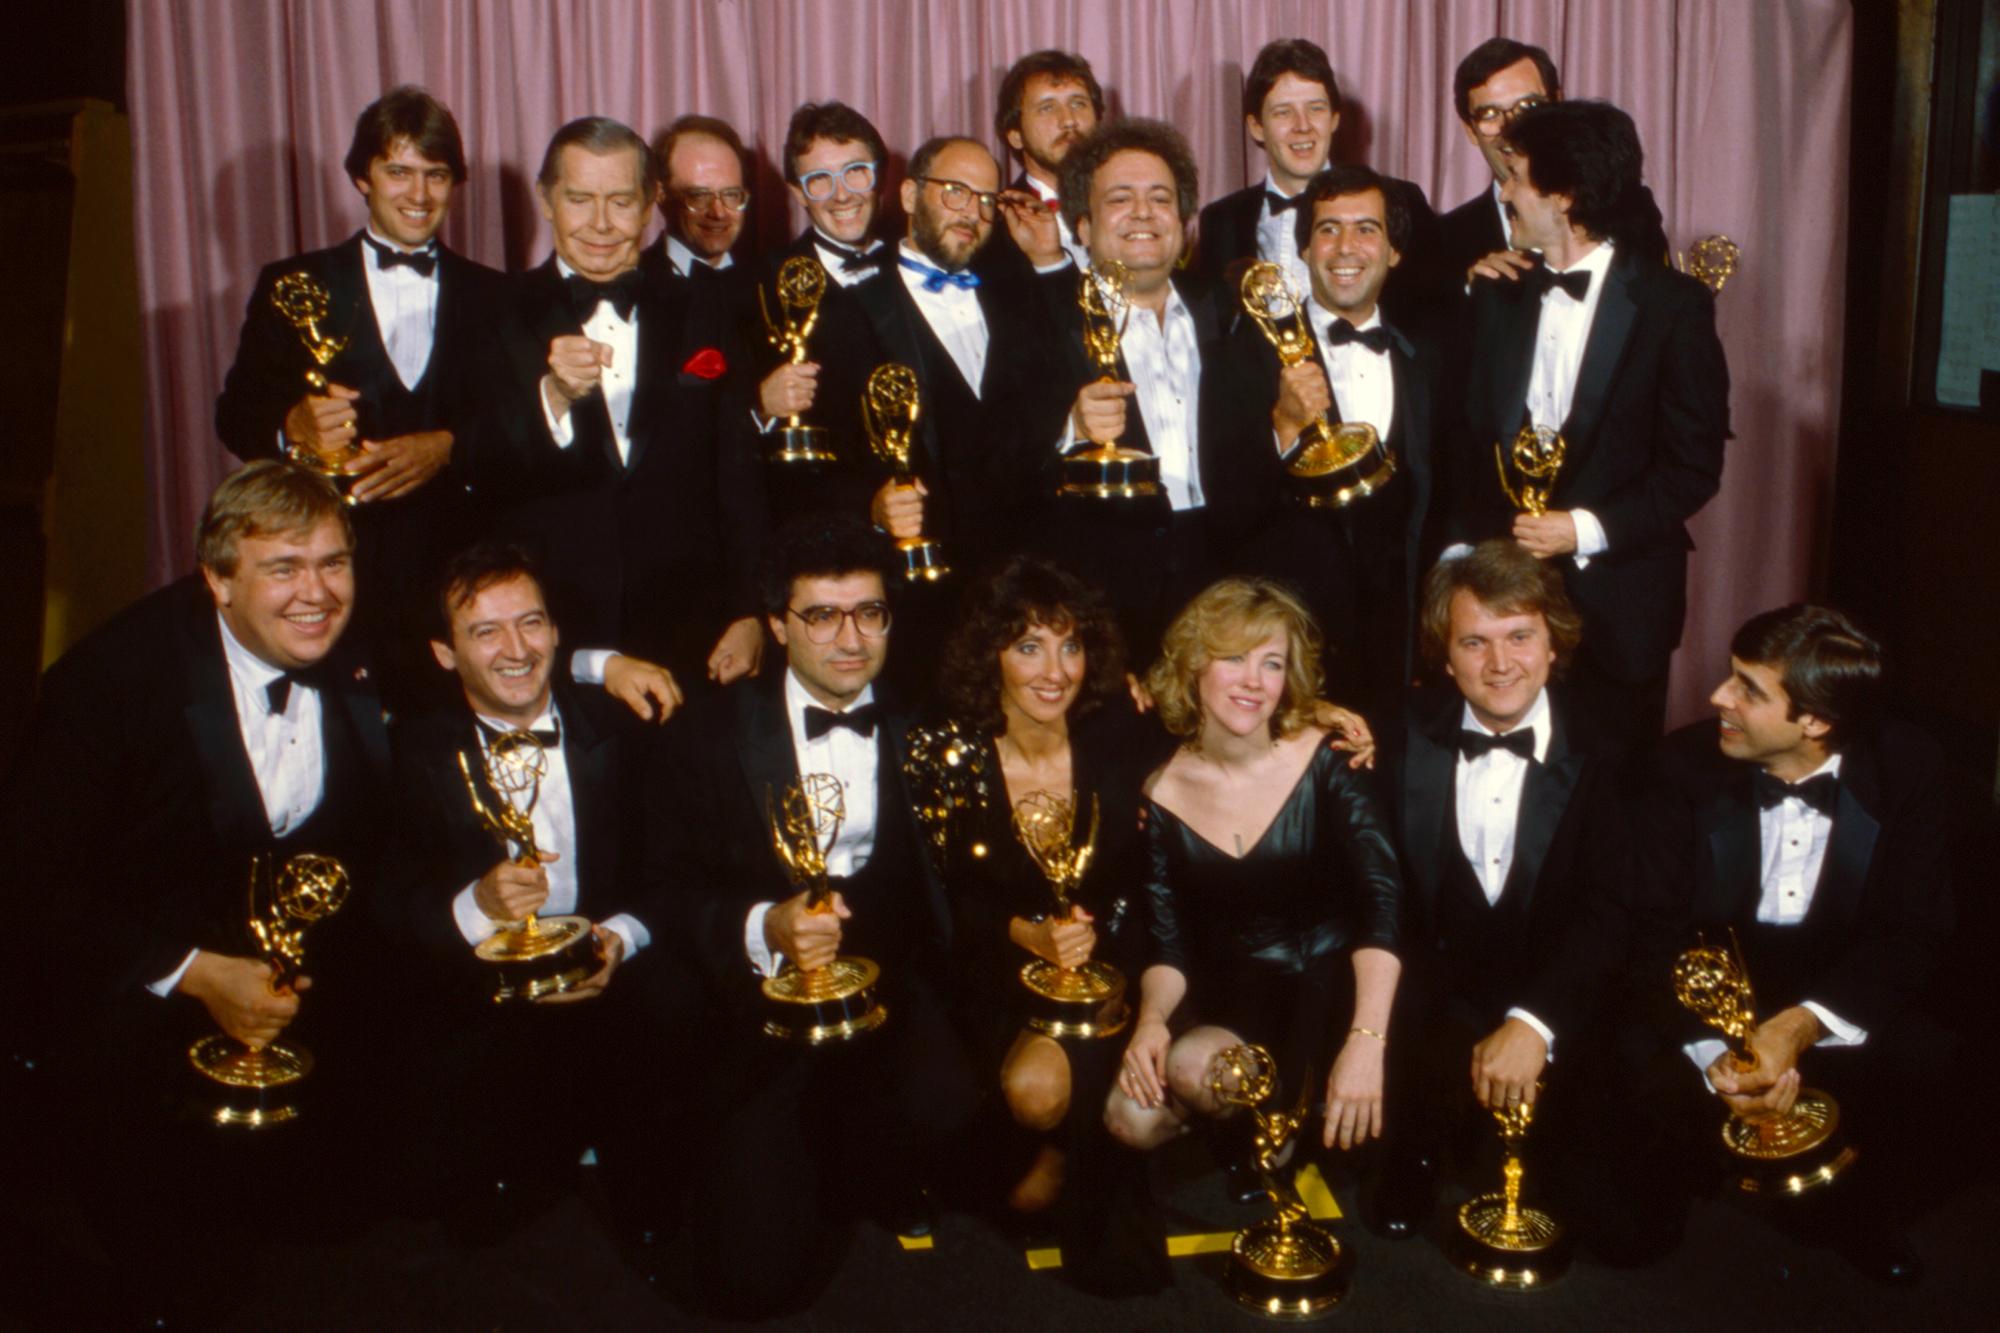 The 1982 Primetime Emmy Awards